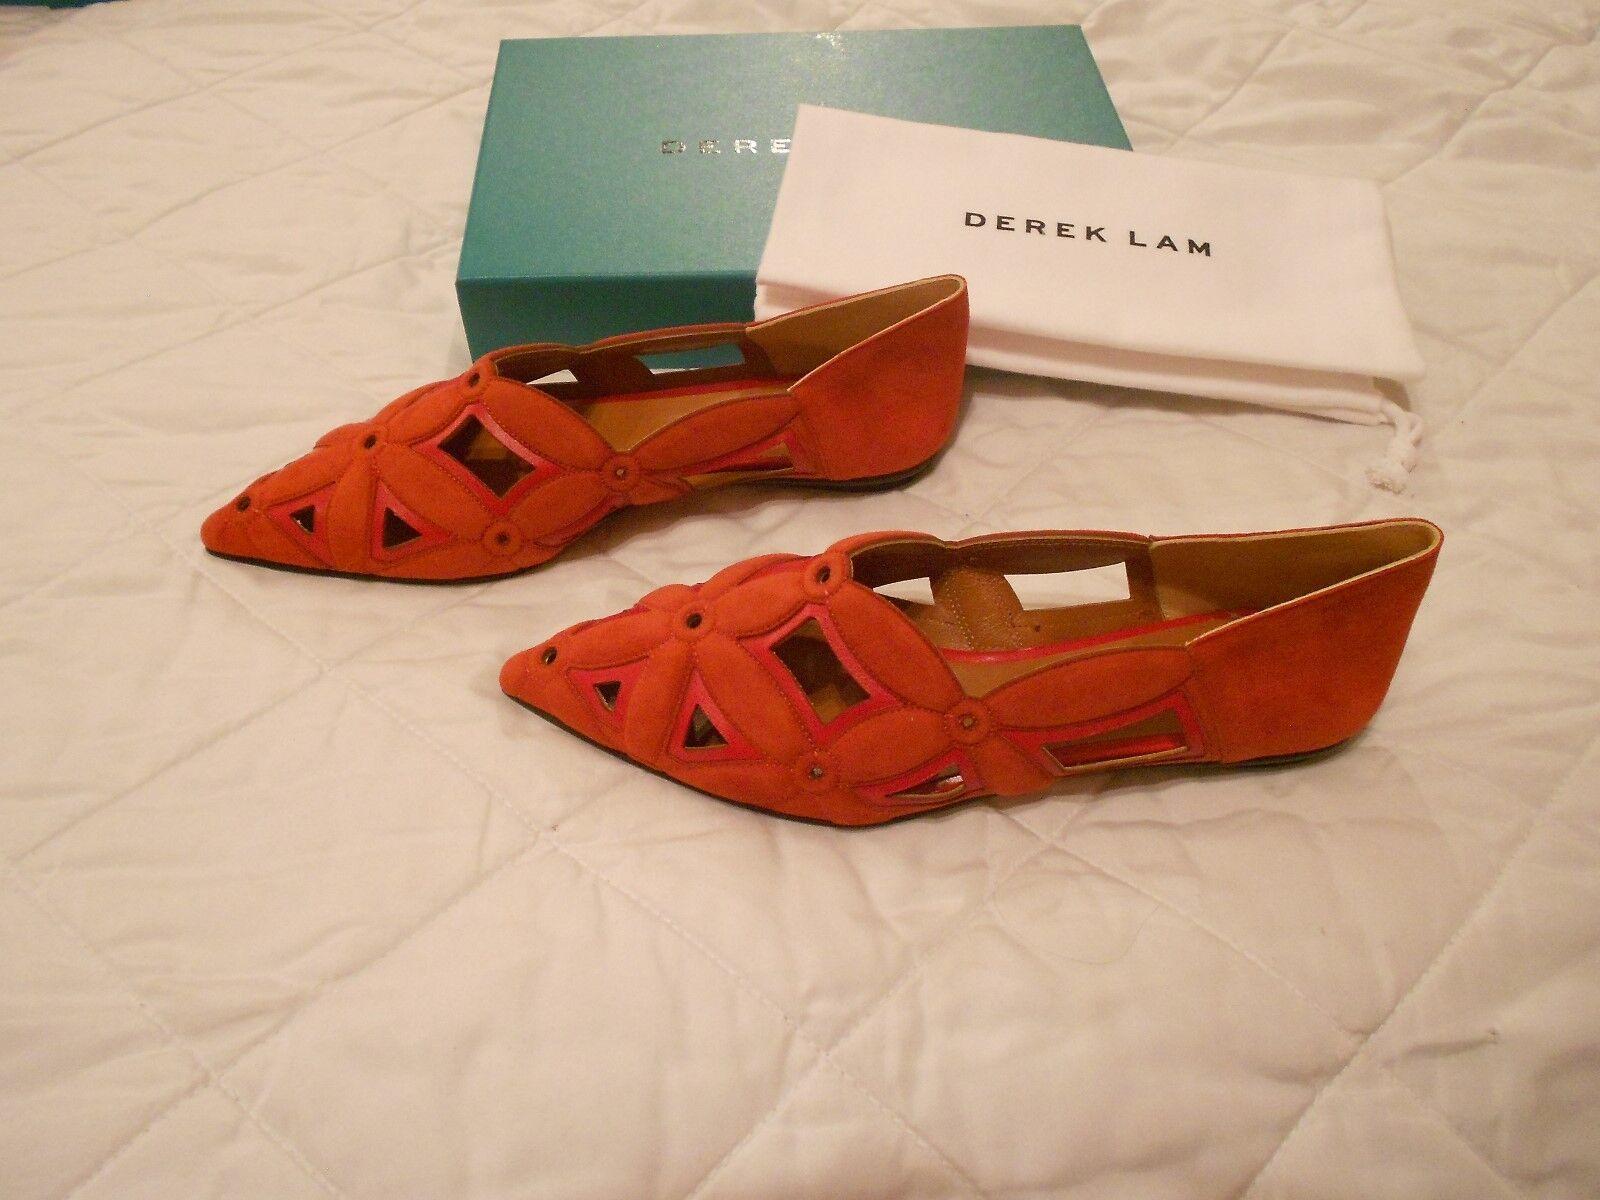 Derek Lam  Saba  Cut Cut Cut Out Terracotta Rossa Suede Leather Flats, Size 39.5,  795 3003ce